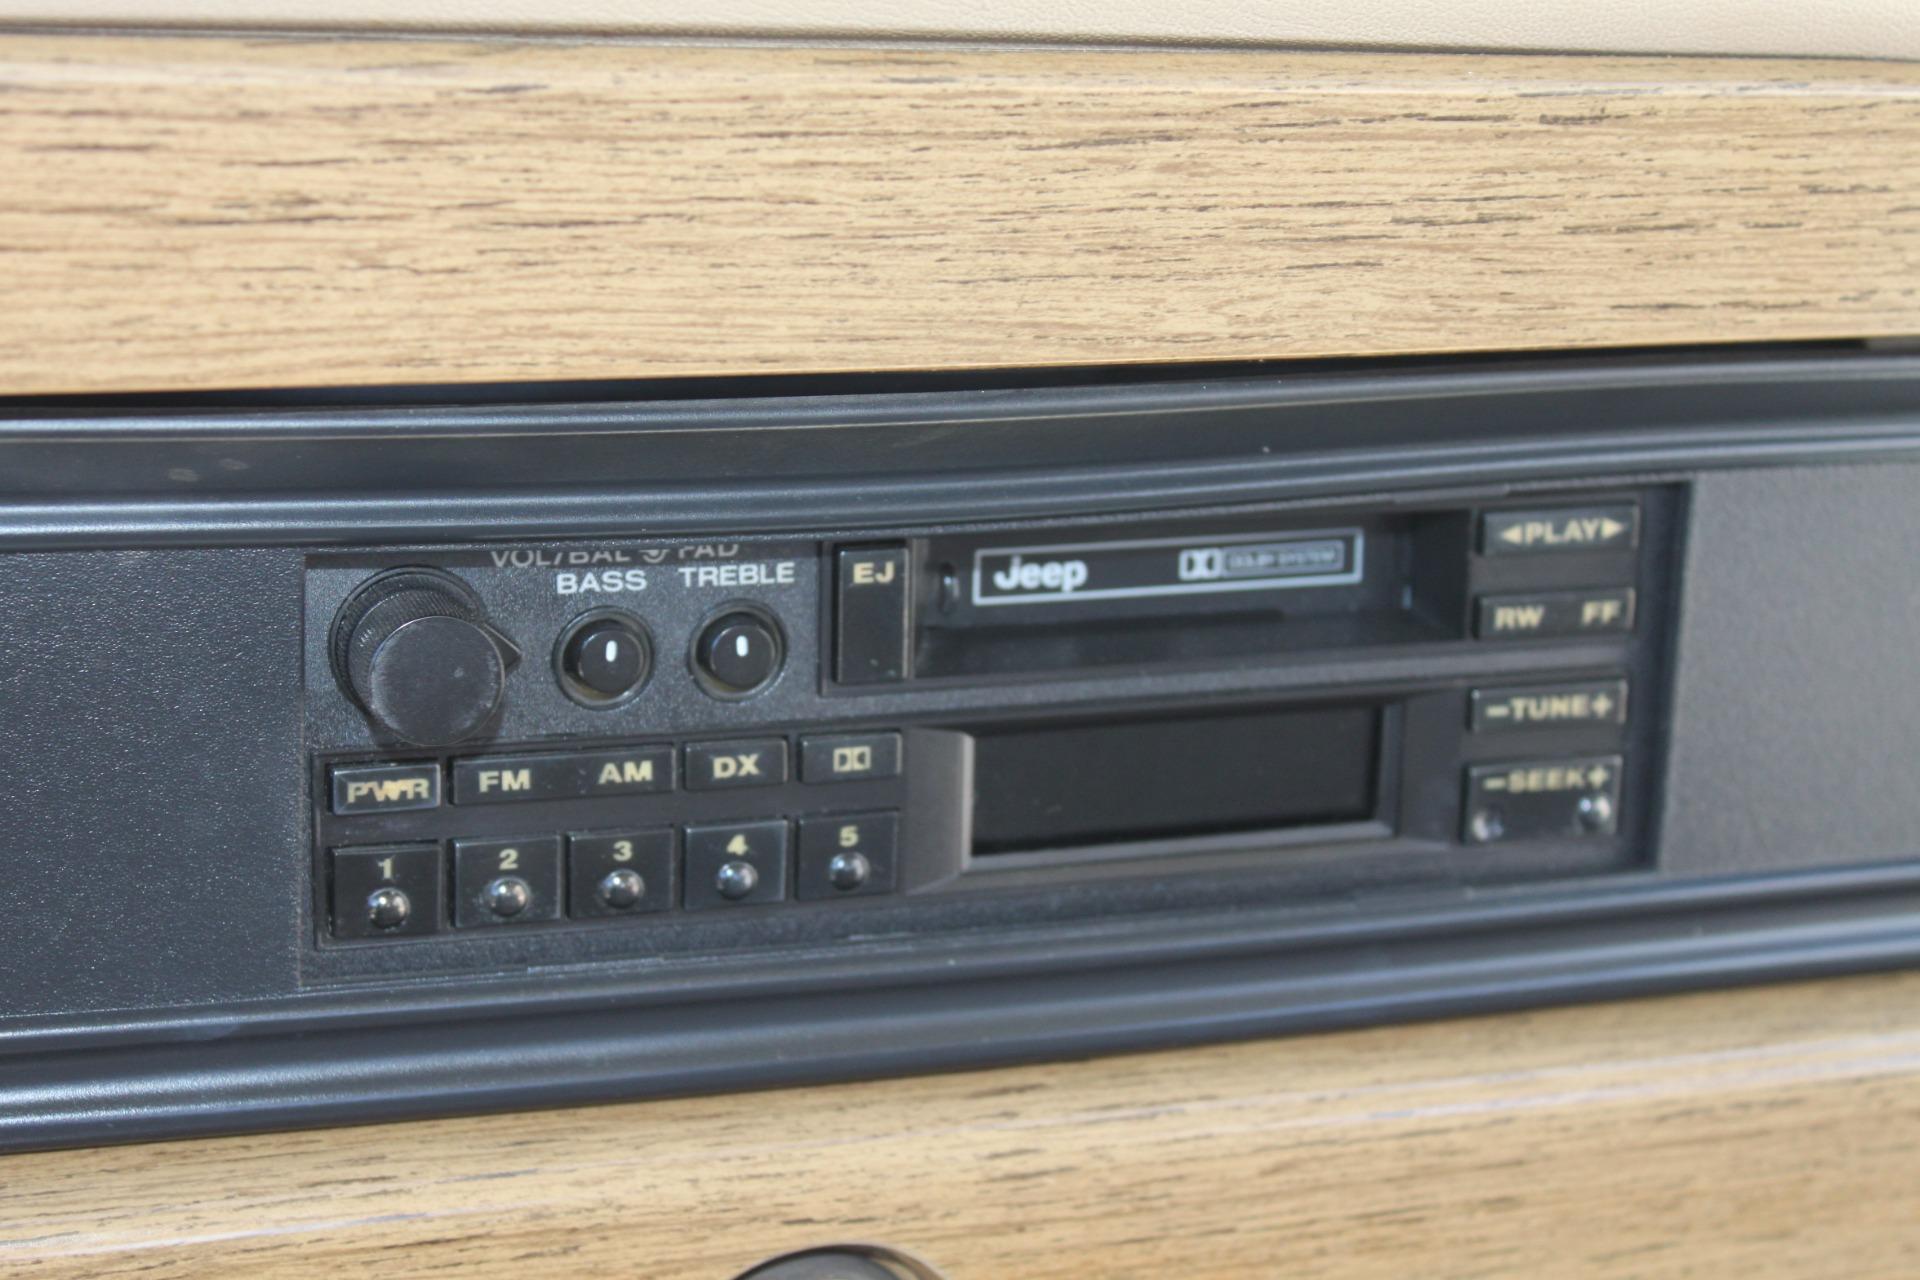 Used-1990-Jeep-Grand-Wagoneer-4X4-Audi